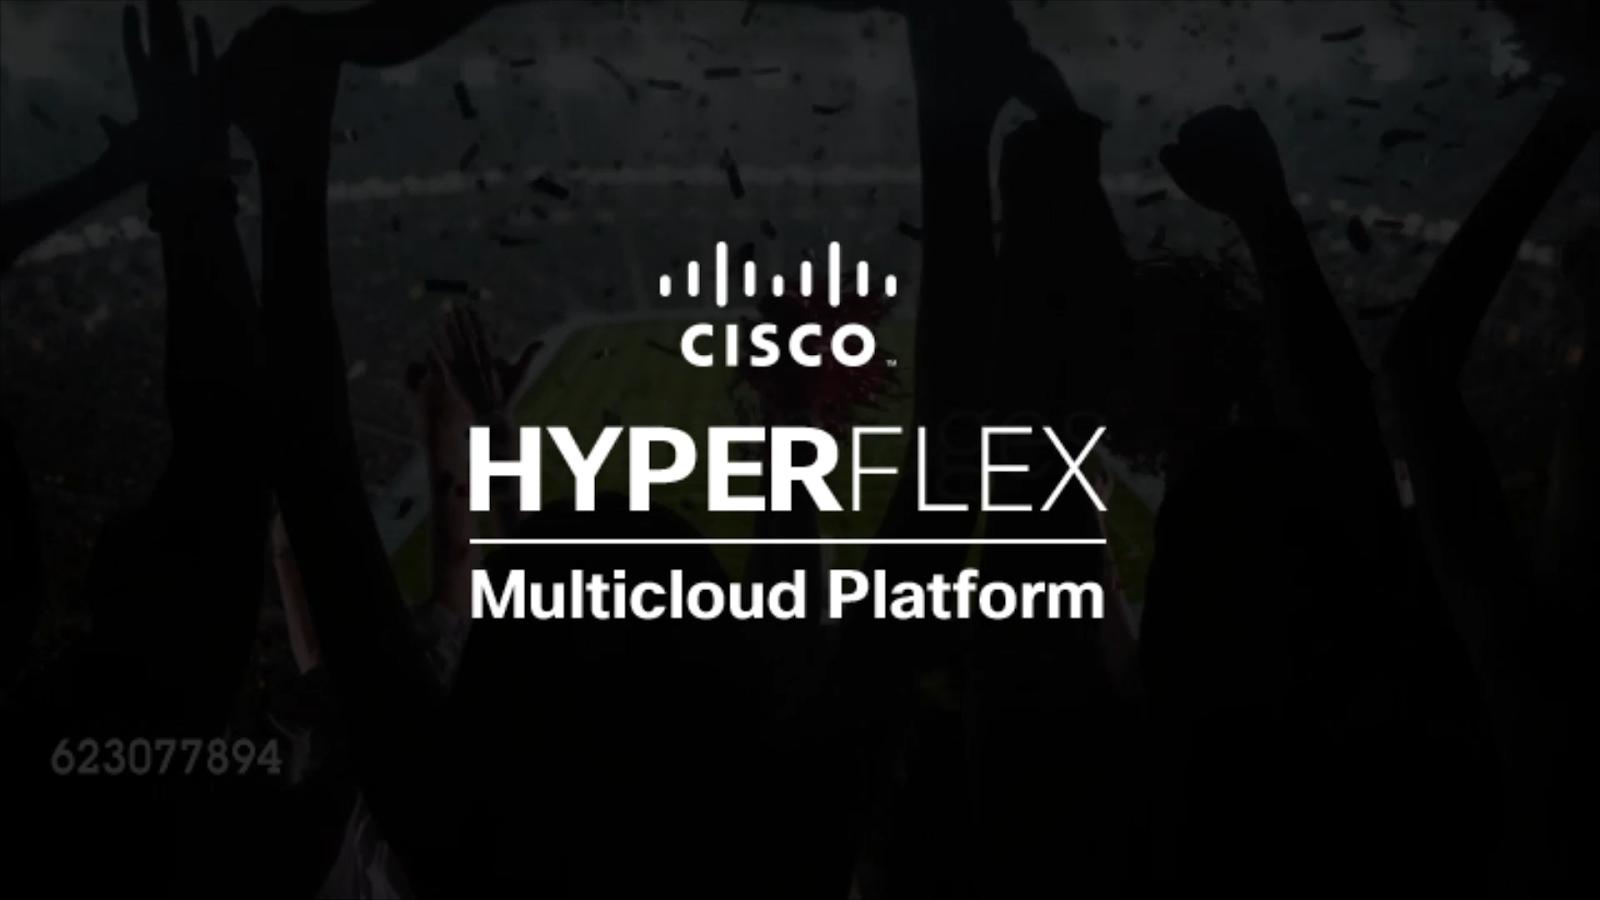 Hyperflex Multicloud Platform